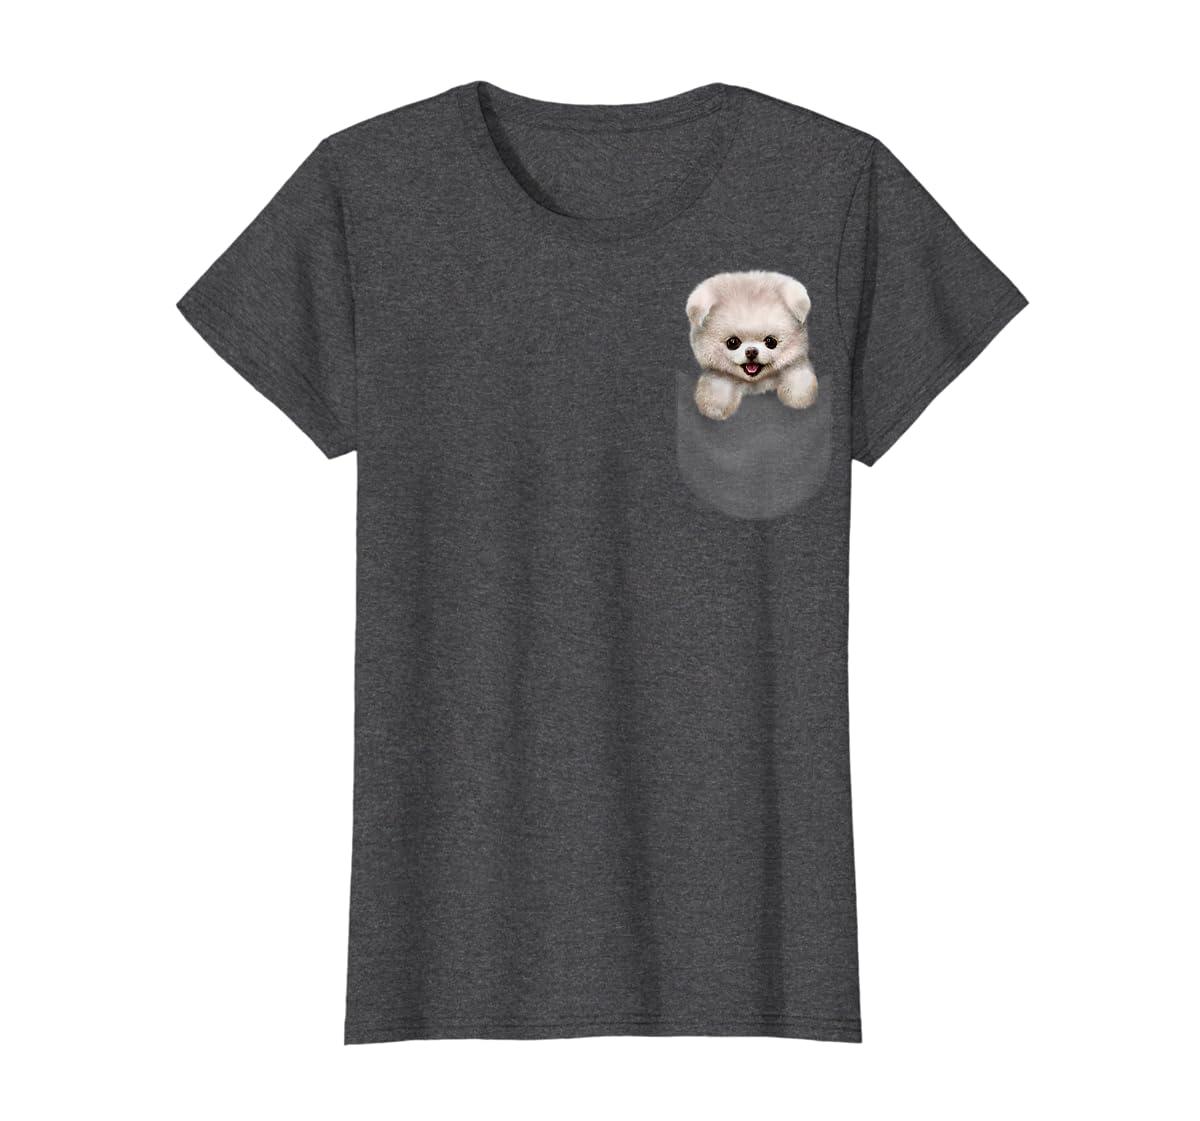 T-Shirt, Cute White Fluffy Pomeranian Puppy in Pocket, Dog-Women's T-Shirt-Dark Heather